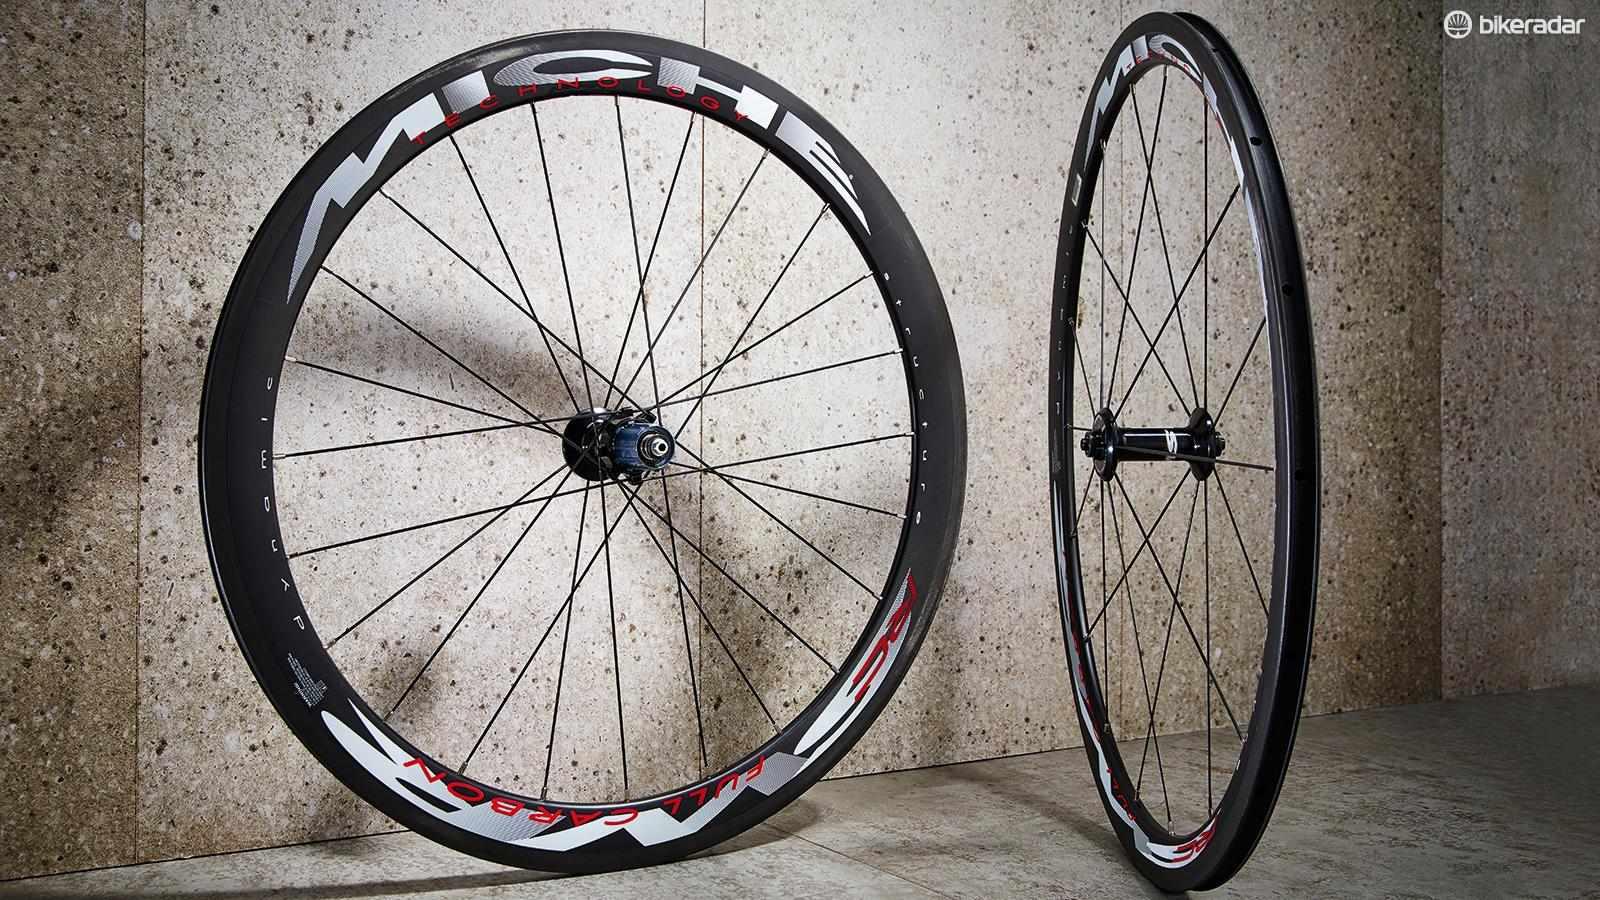 Miche SWR RC wheelset